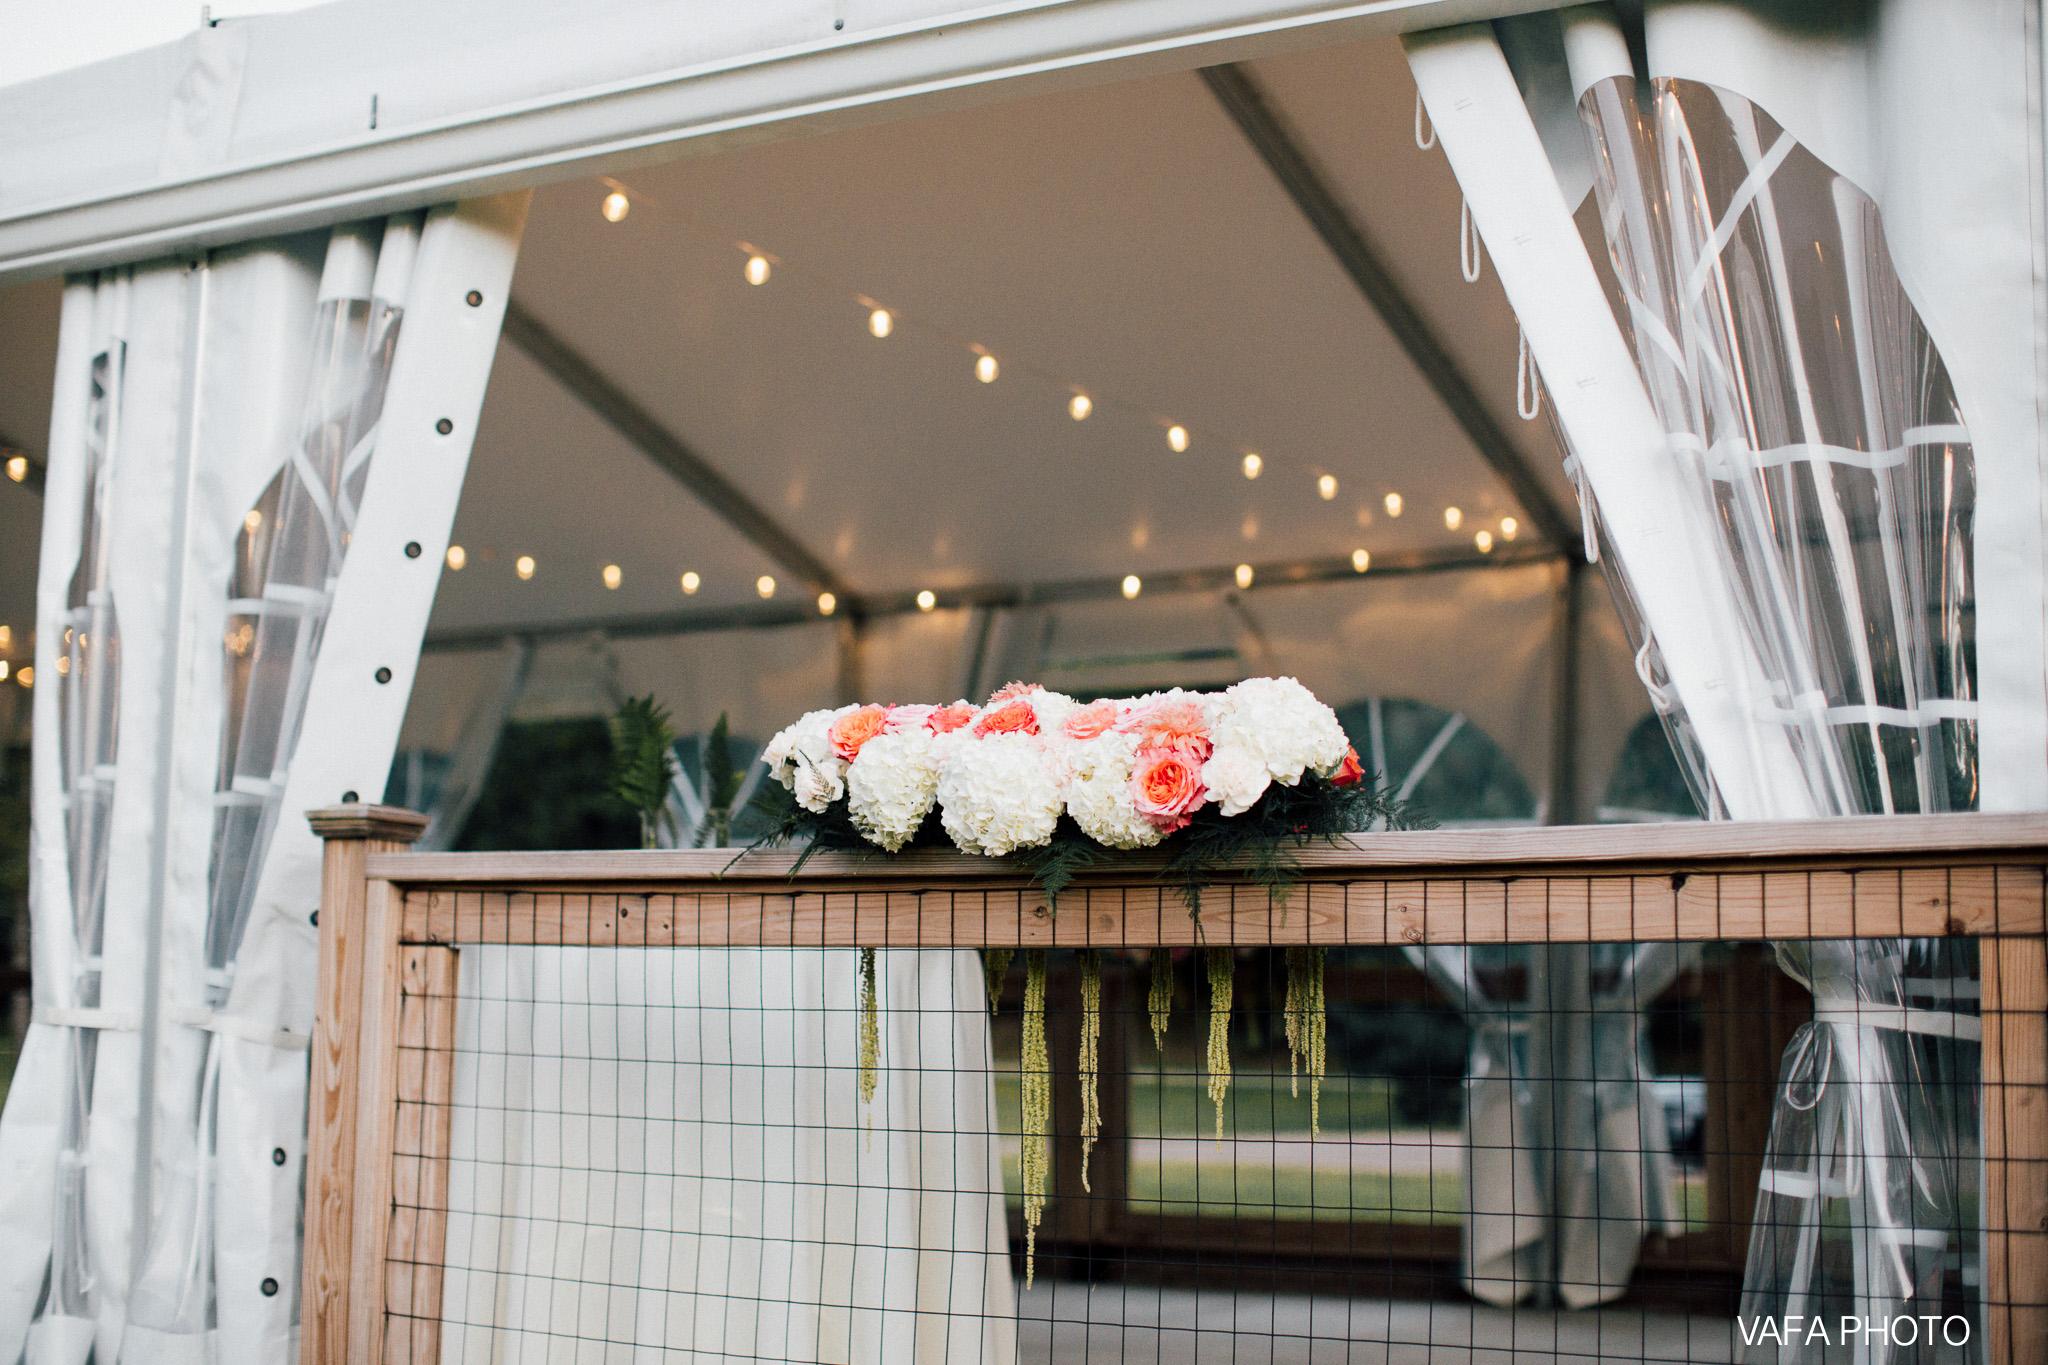 The-Felt-Estate-Wedding-Kailie-David-Vafa-Photo-856.jpg